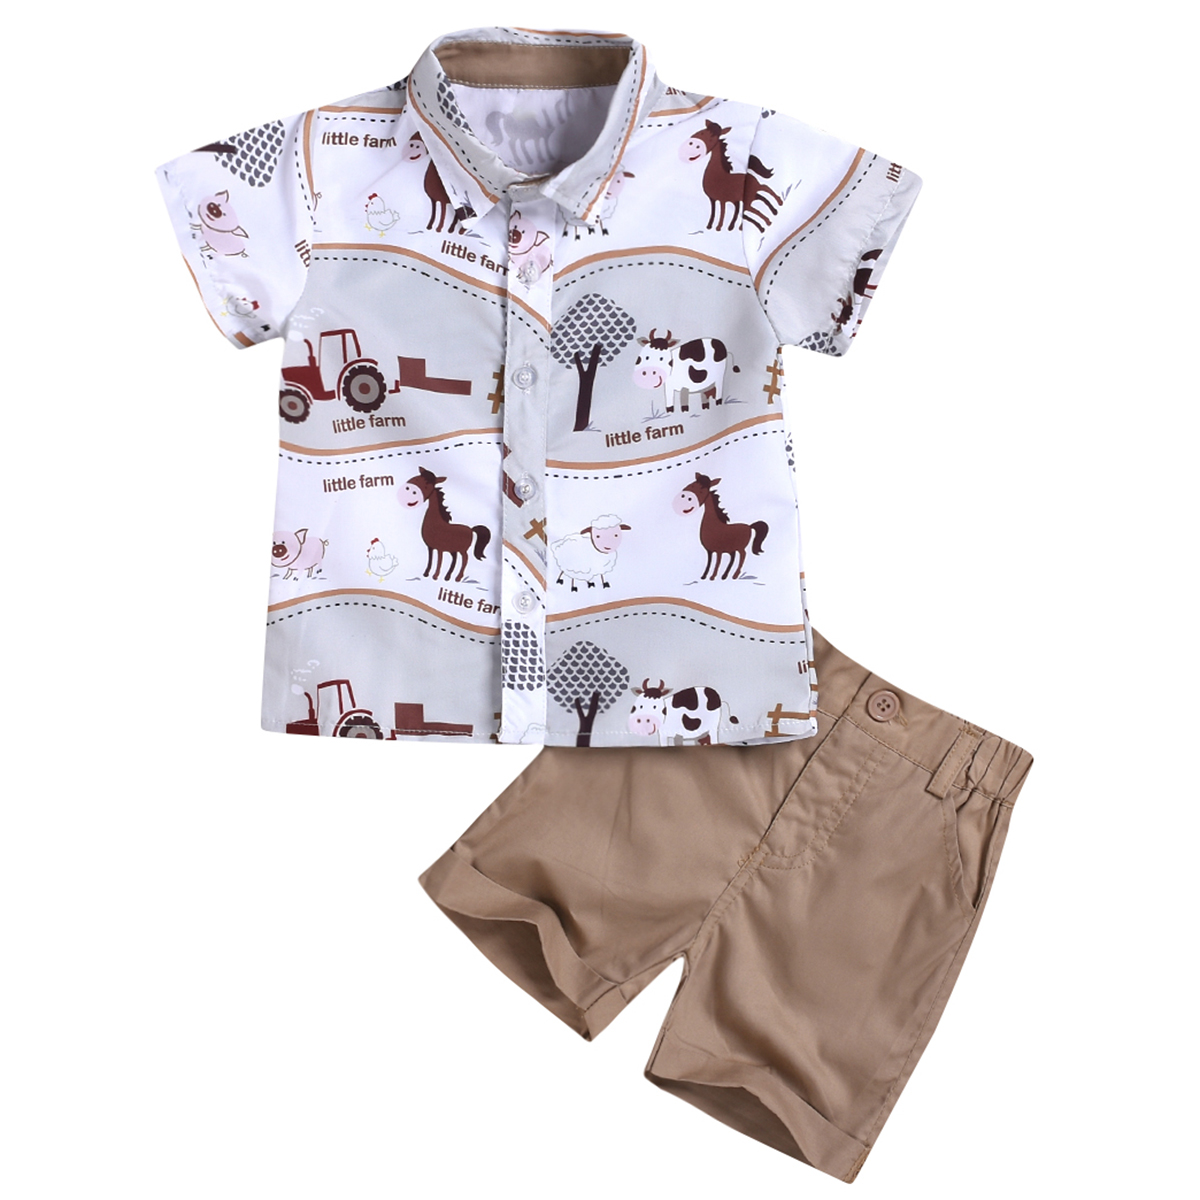 Short Pants 2Pcs Summer Newborn Baby Girl Clothes Rainbow Outfits T-Shirt Tops